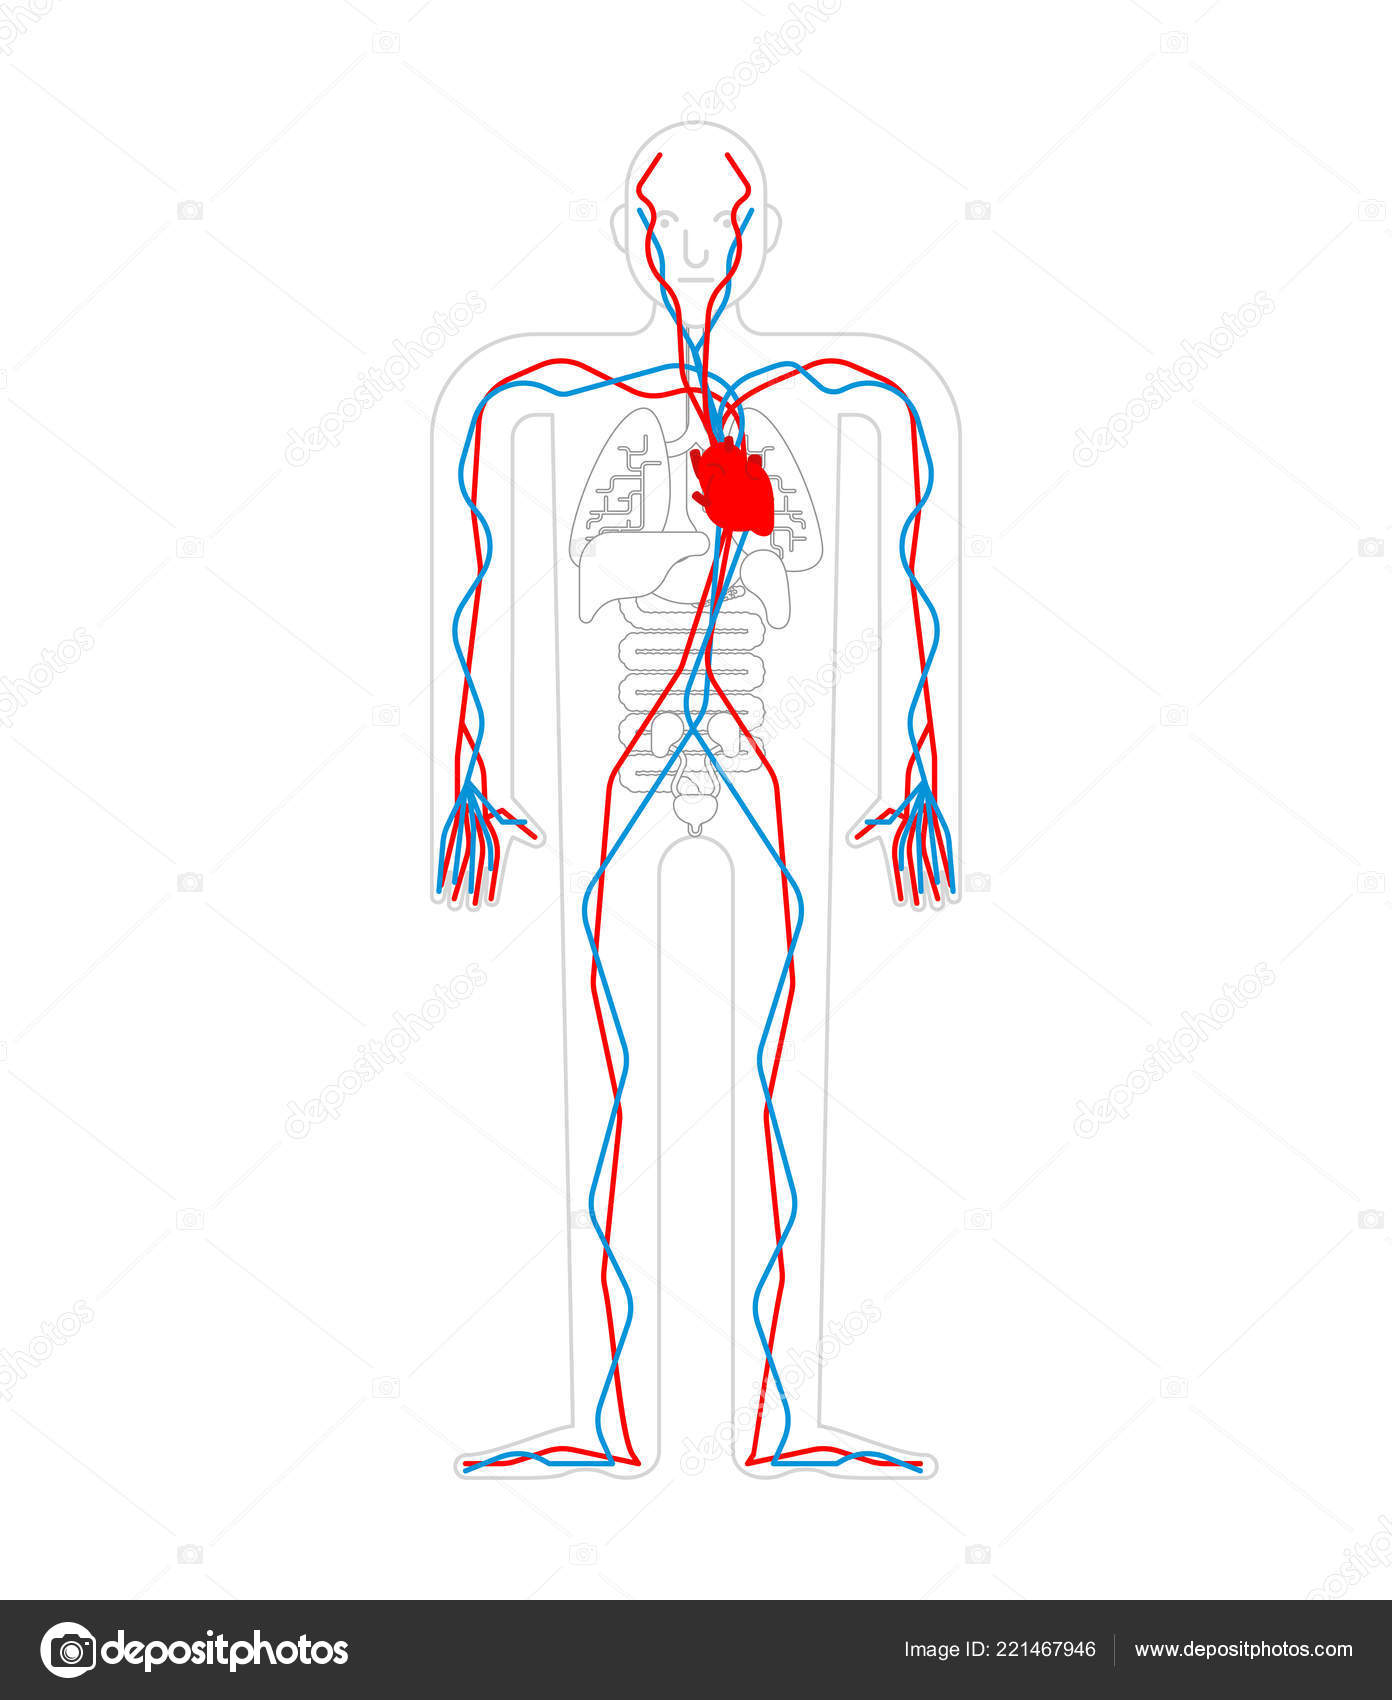 Circulatory System Heart Blood Vessels Aorta Artery Human Anatomy